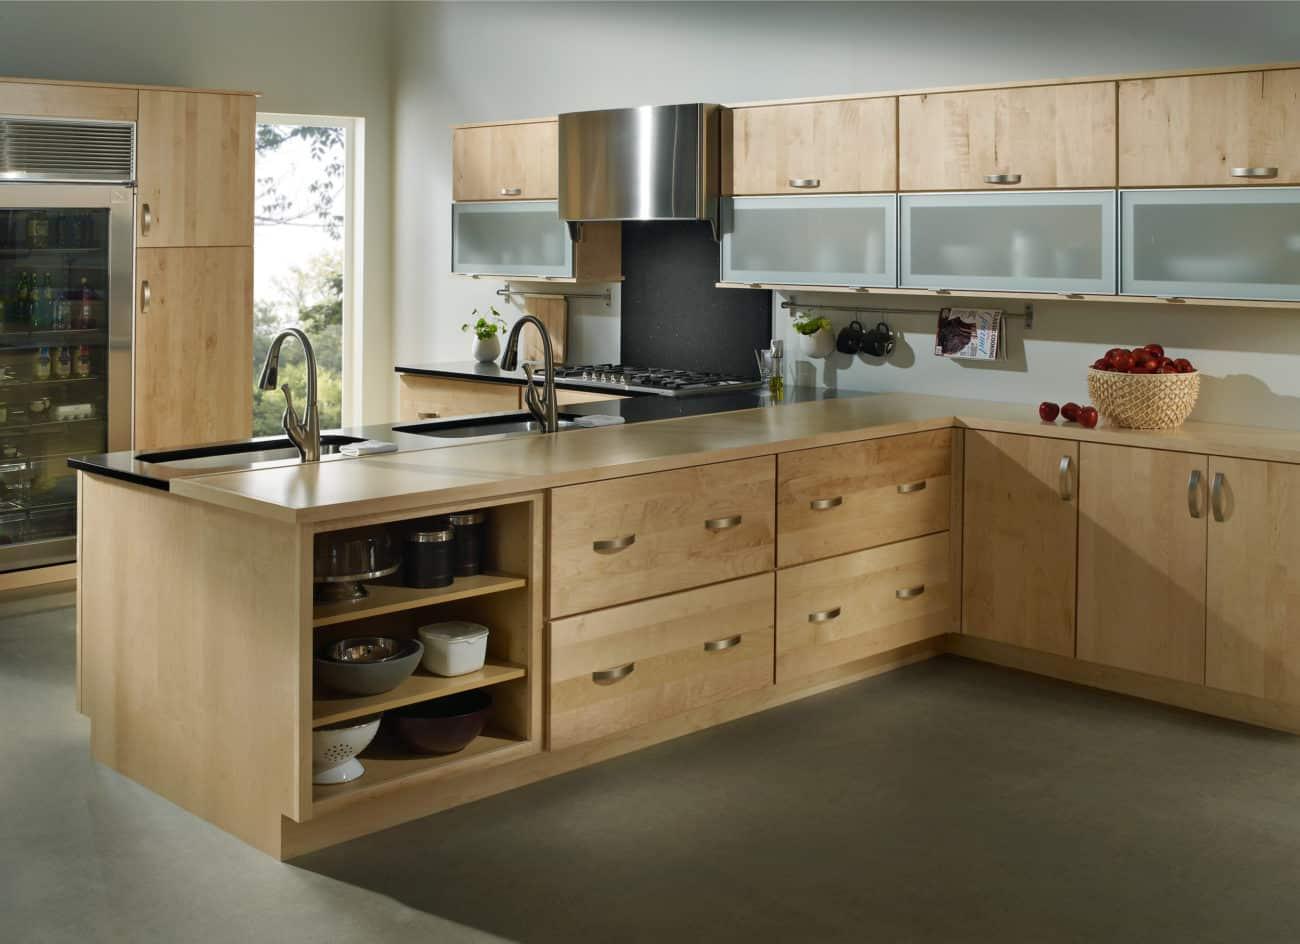 light wood kitchen cabinets light wood kitchen cabinets Light Wood Kitchen Cabinets